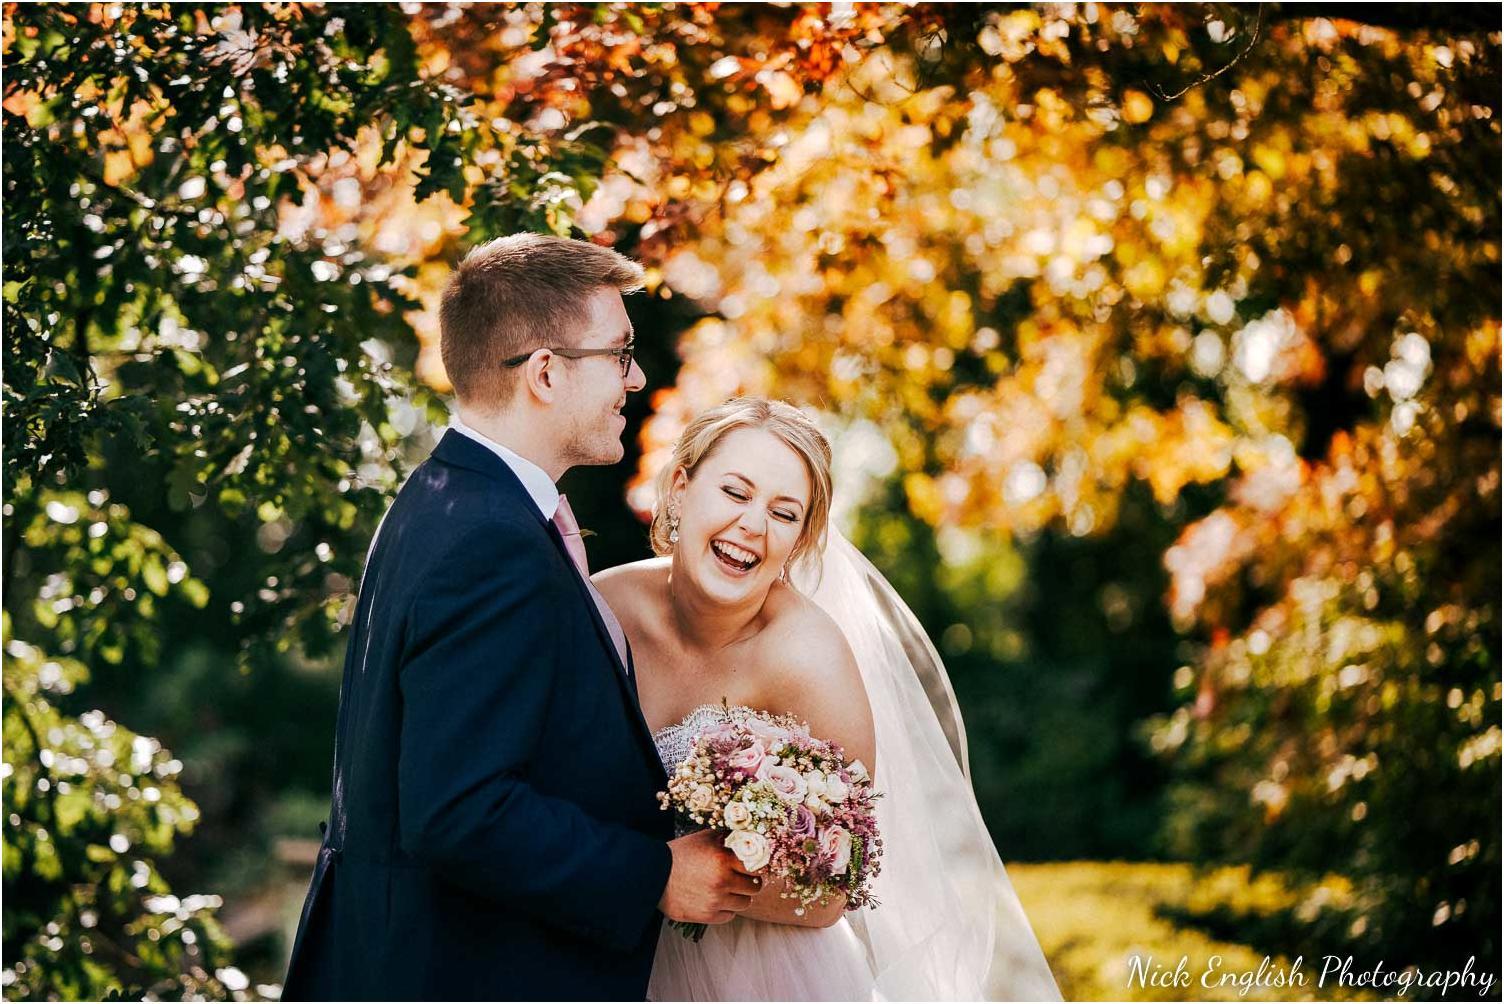 Eaves_Hall_Wedding_Photographer-69.jpg